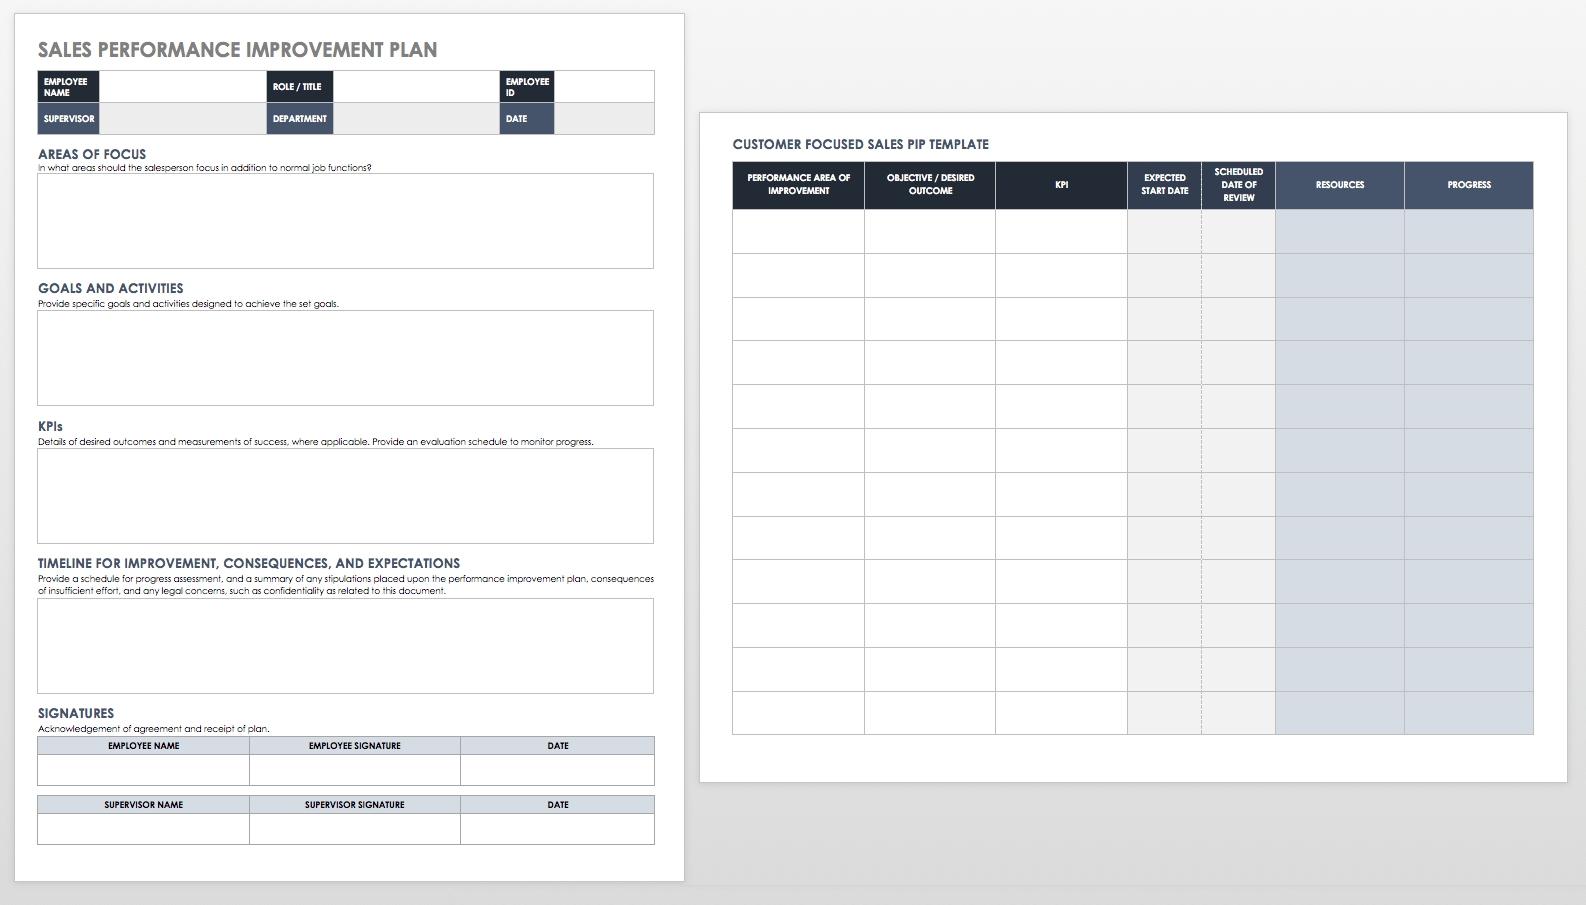 Performance Improvement Plan Templates | Smartsheet with regard to Annual Employee Planning Report Sample